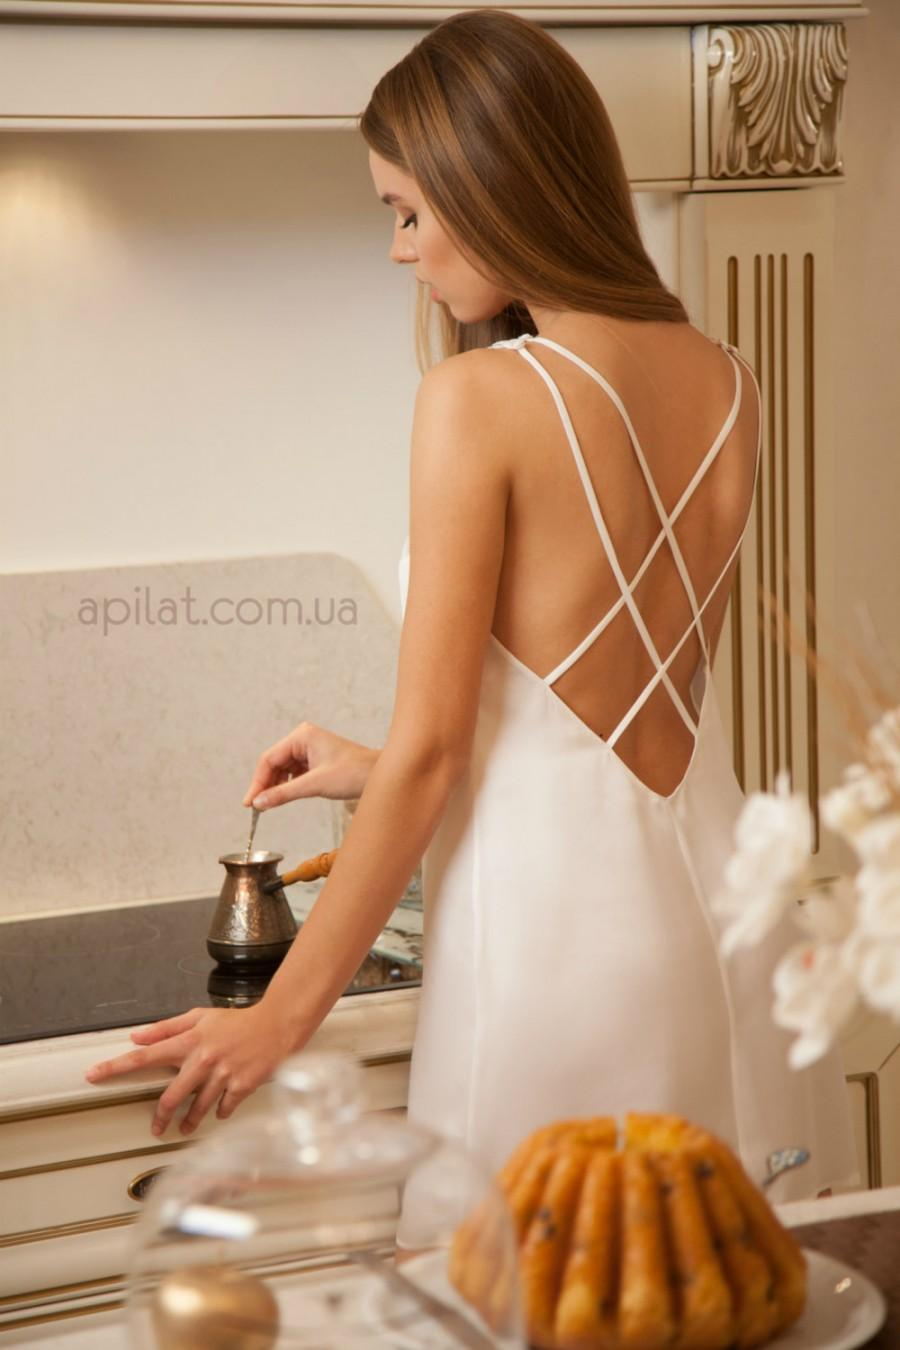 Свадьба - Bridal Silk Chemise from Pure Silk D11, Short Wedding Nightgown (Lingerie, Nightdress), Bridal Lingerie, Wedding Lingerie, Honeymoon